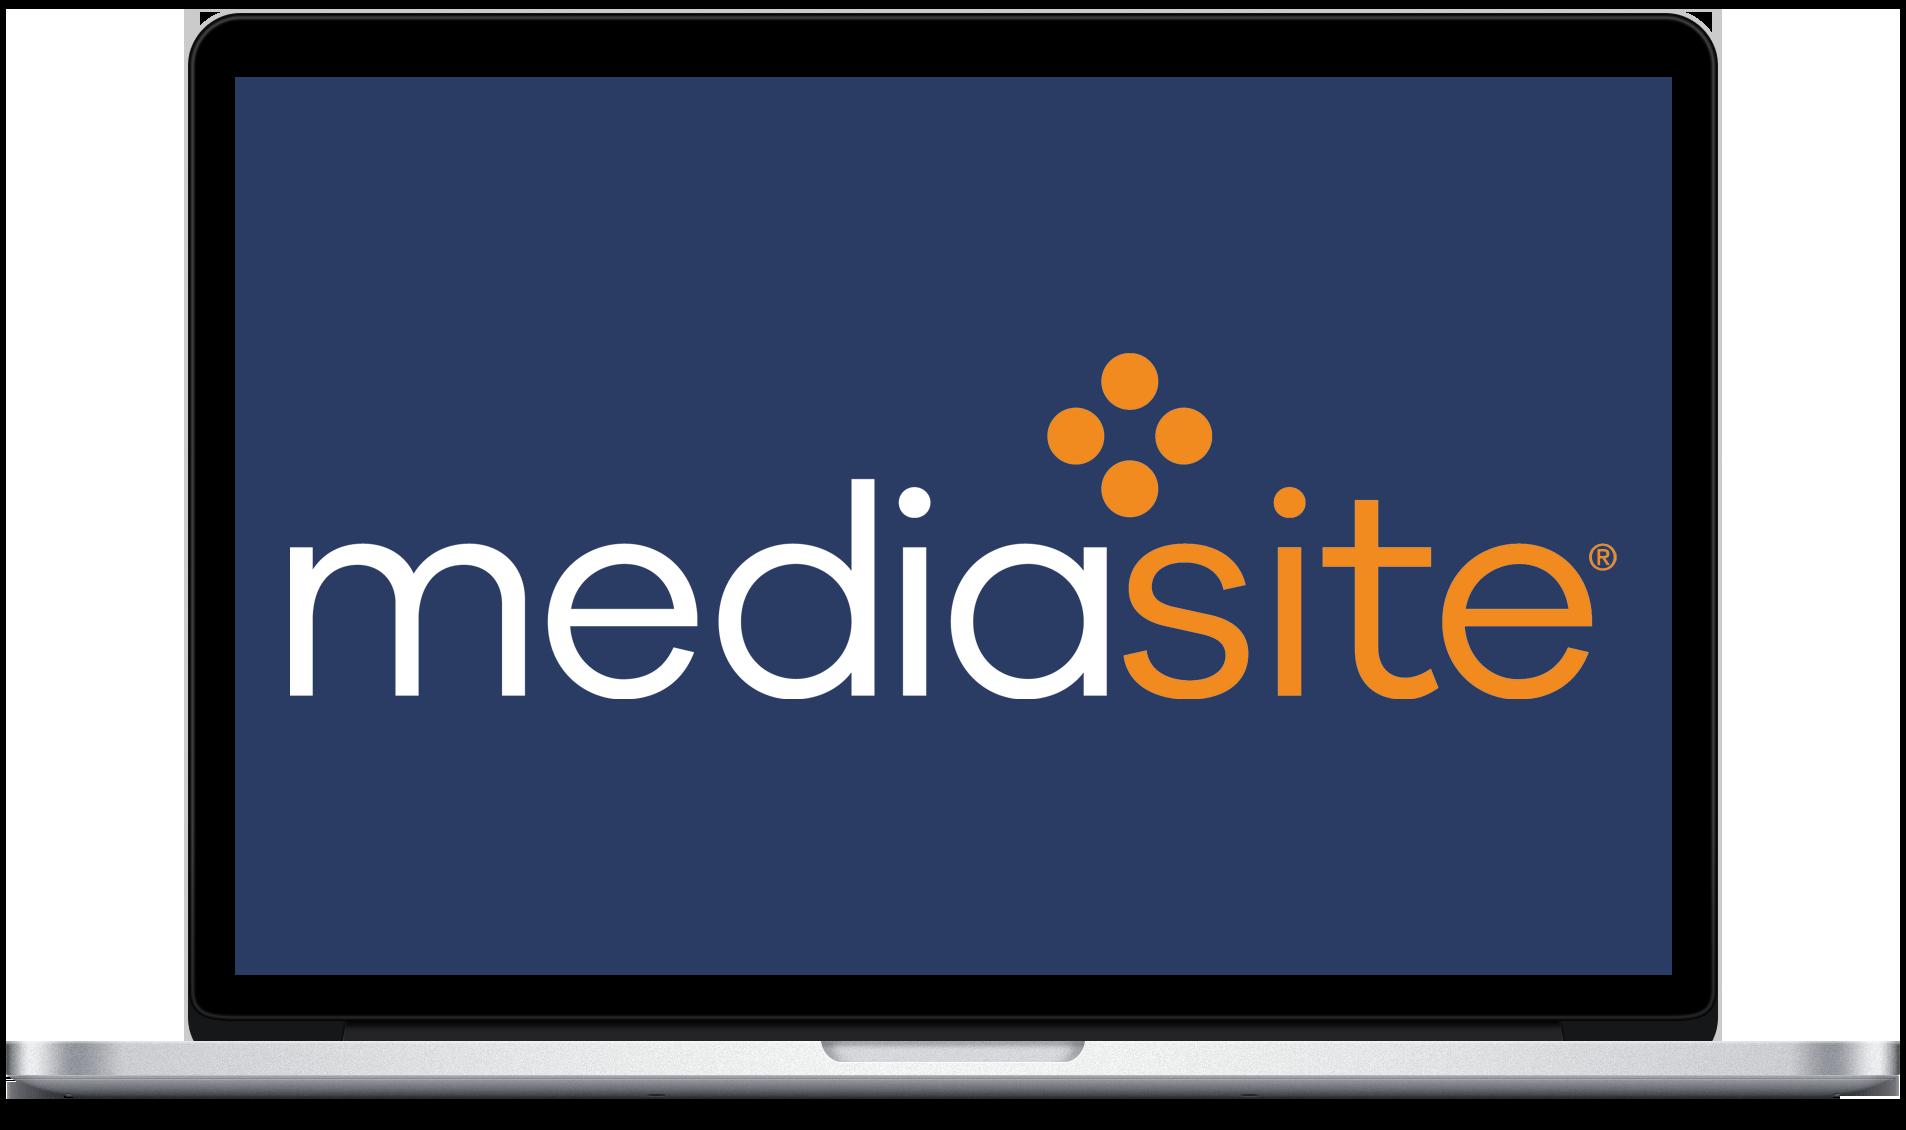 Mediasite laptop